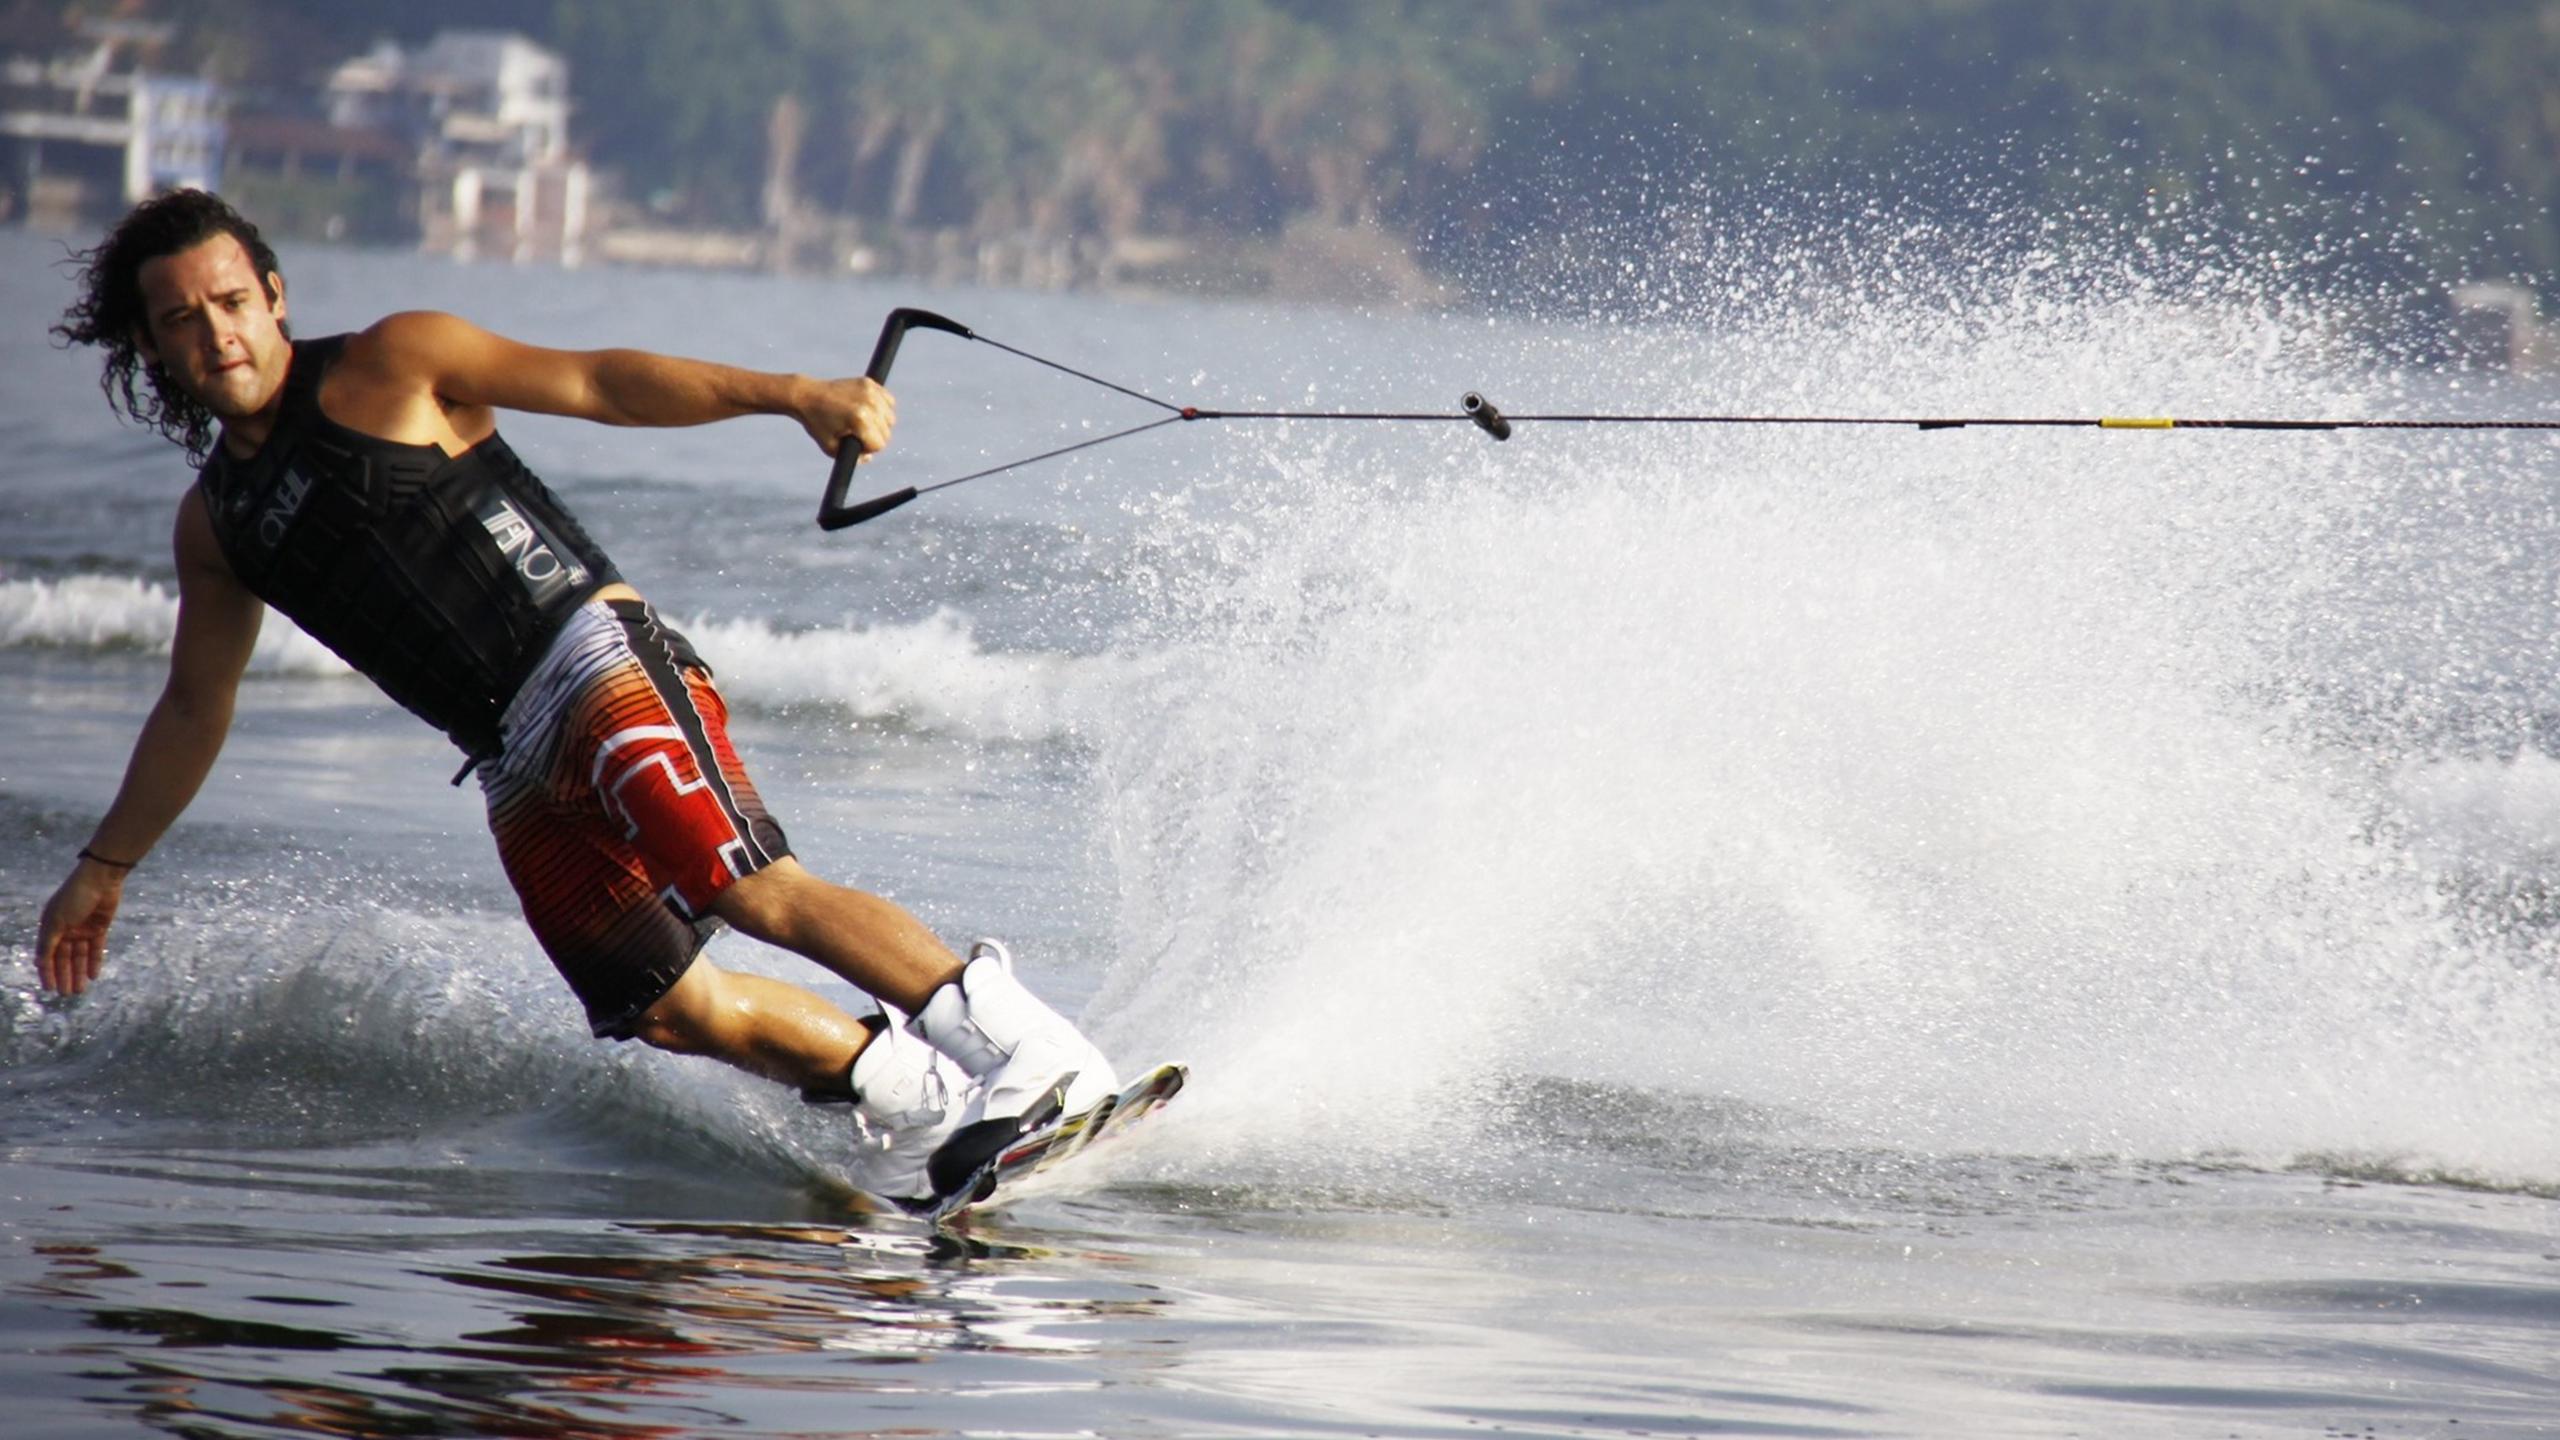 mexico-lake-man-wakeboard-46537